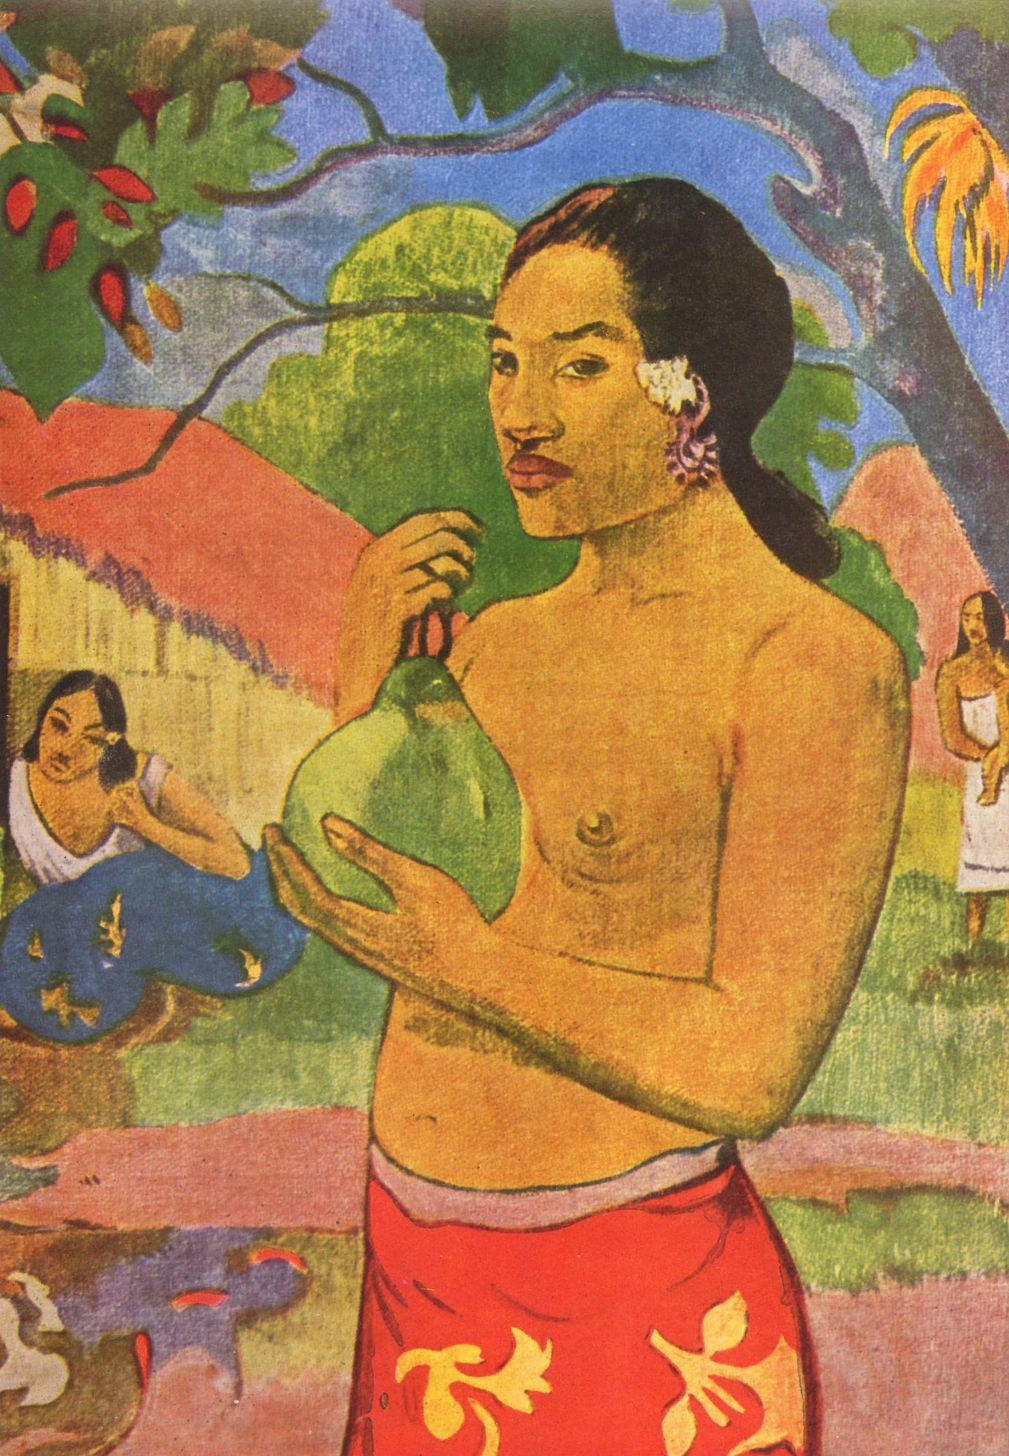 Paul Gauguin. Woman holding a fruit. Fragment